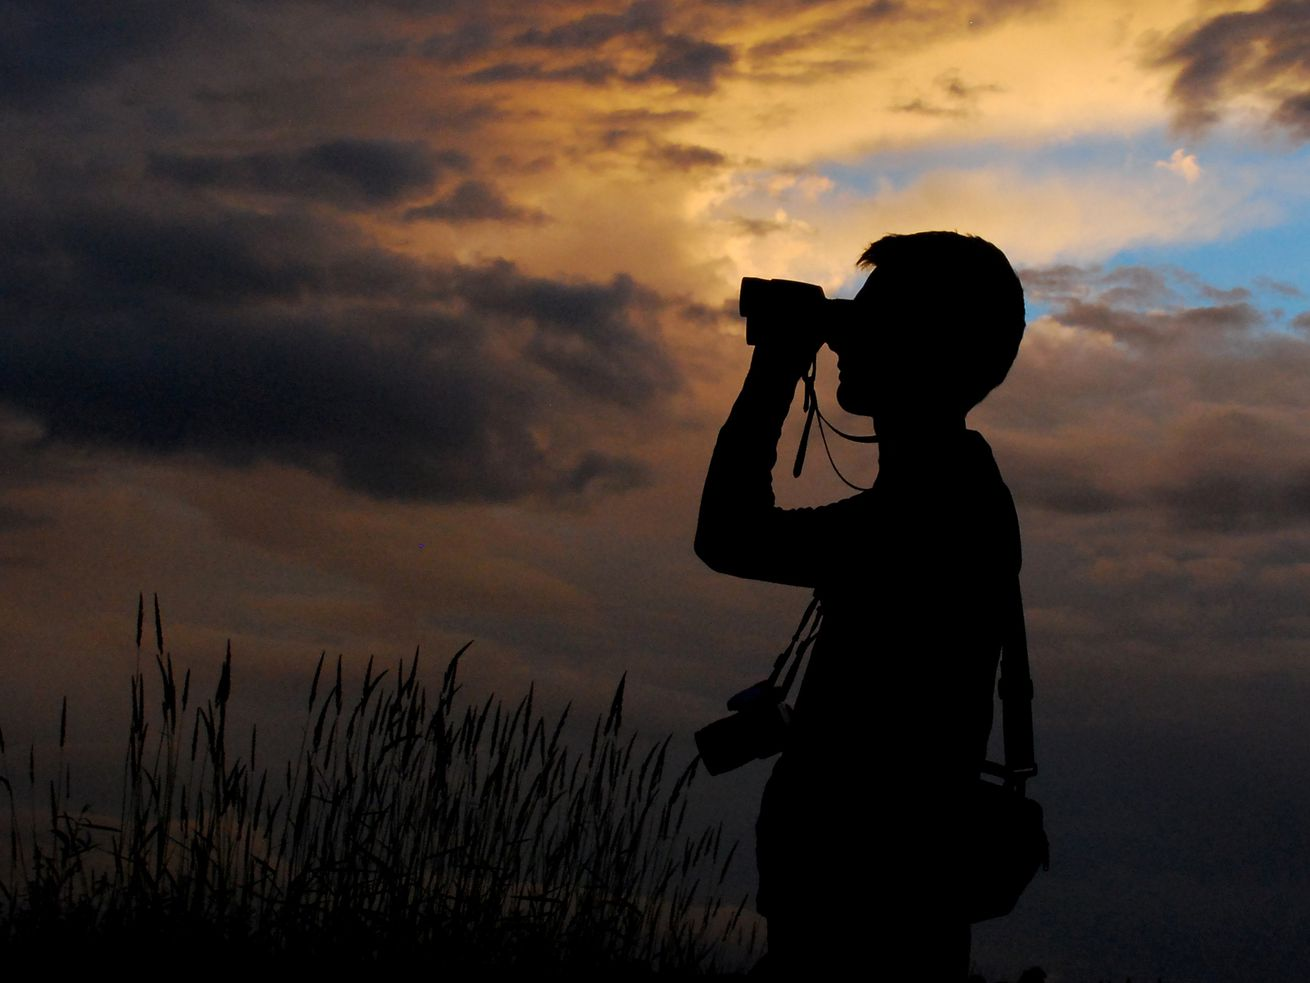 Enjoy bird-watching? Help biologists gather information during annual bird count